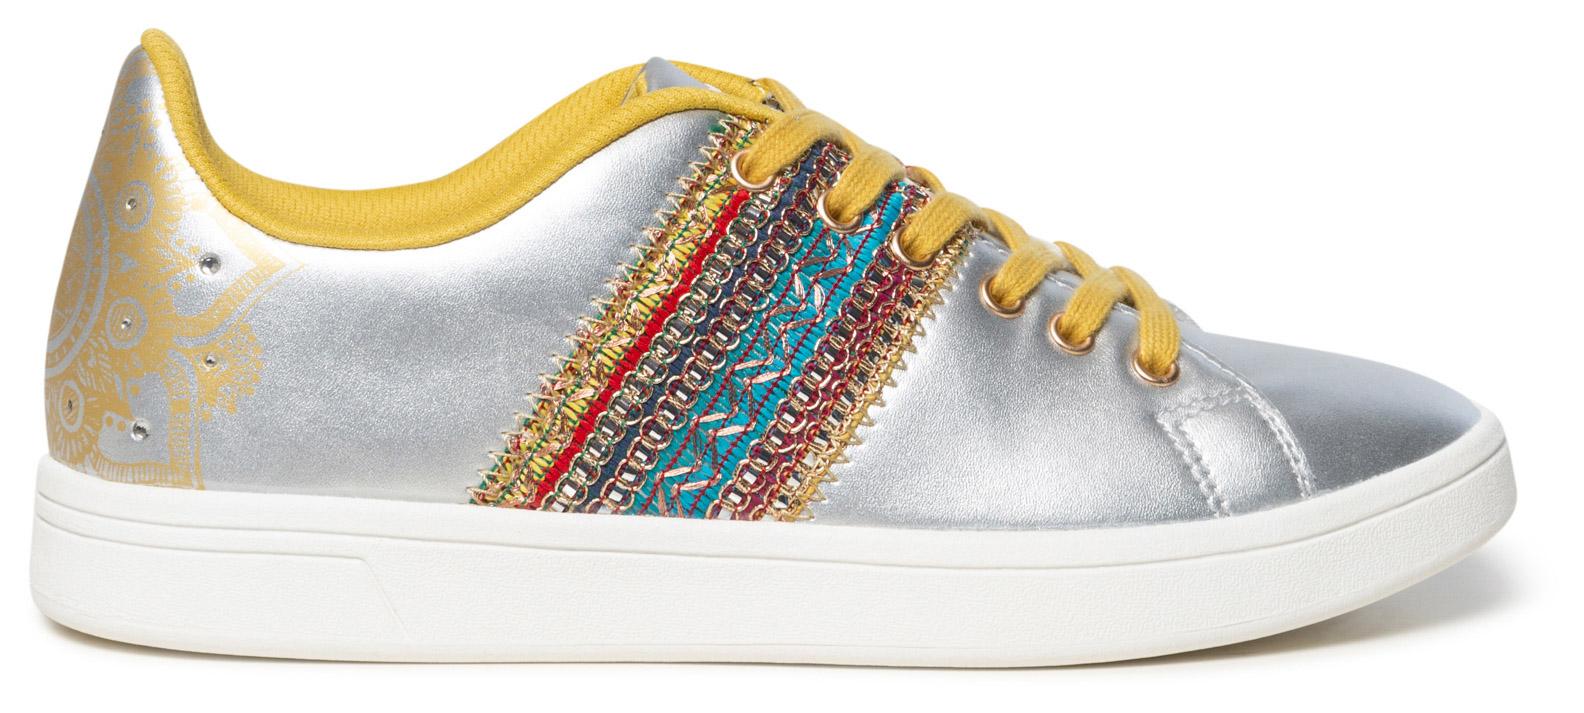 Desigual tenisky Shoes Cosmic Exotic Moon